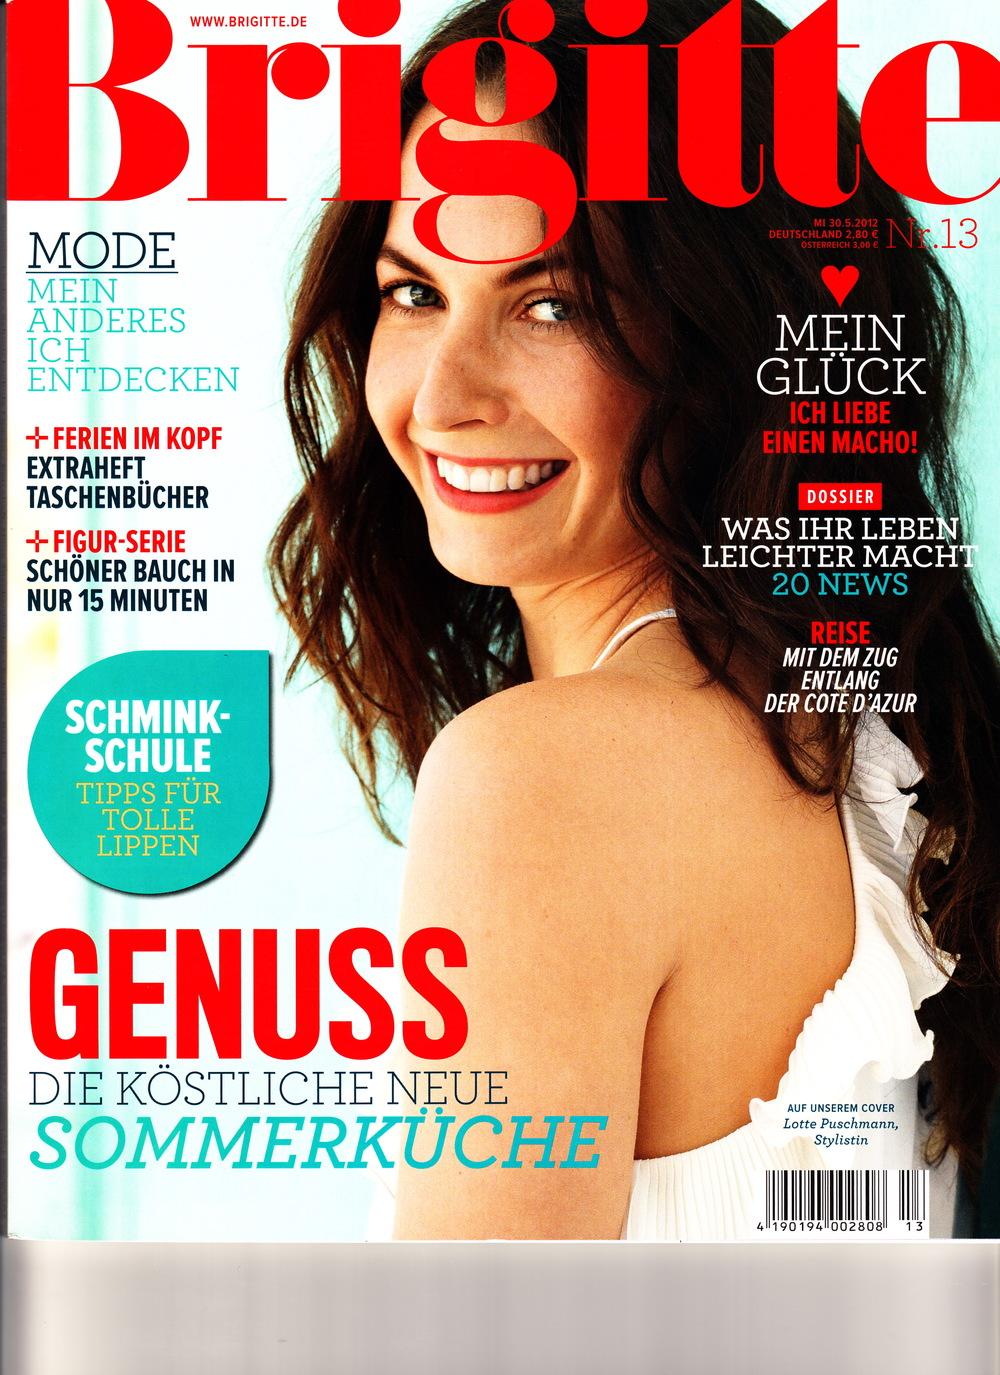 Brigitte Juni 2012 Cover.jpg